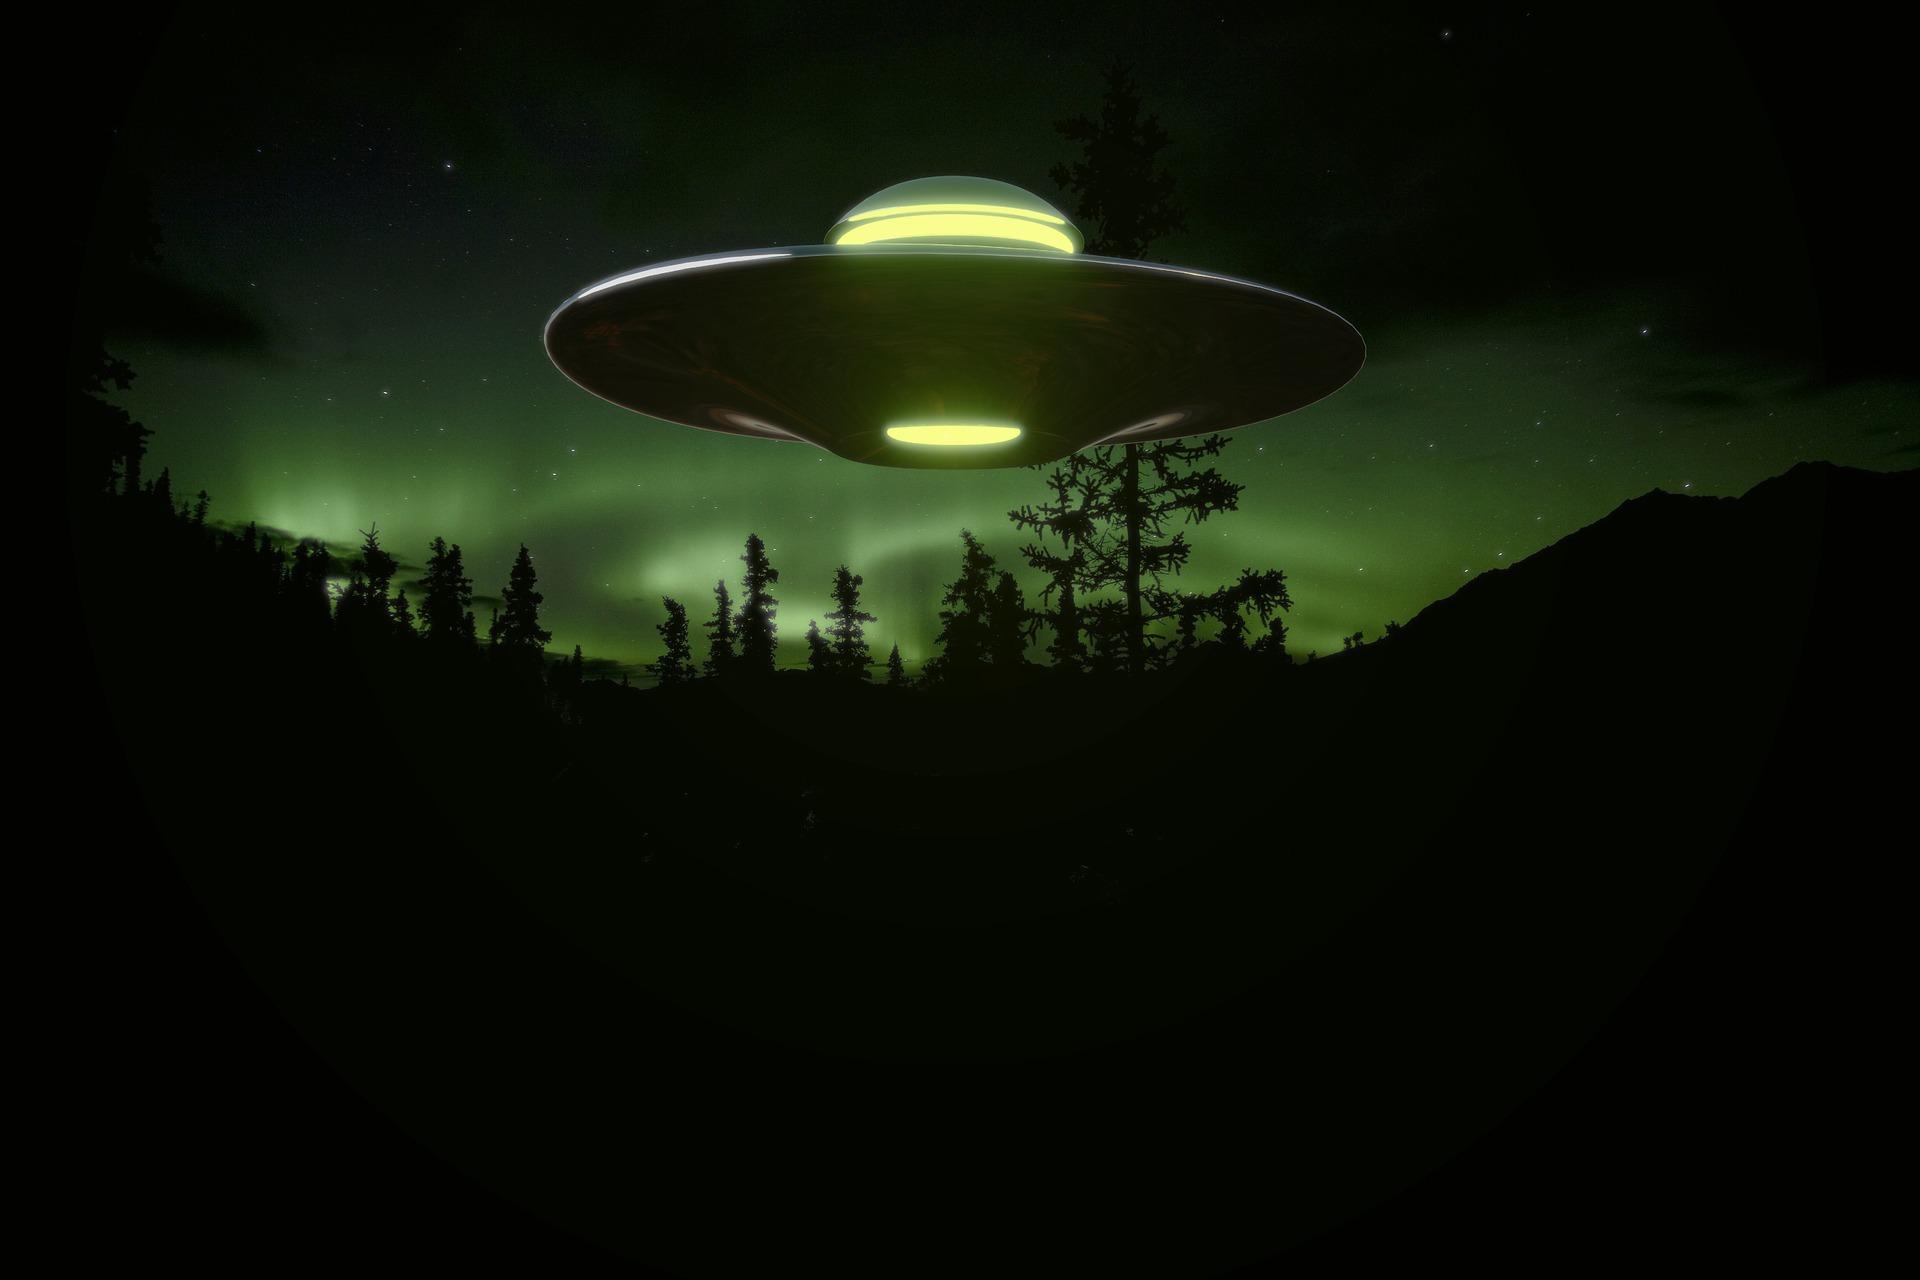 The Bury X Files Is Borough One Of Uk S Biggest Ufo Hotspots Bury Times